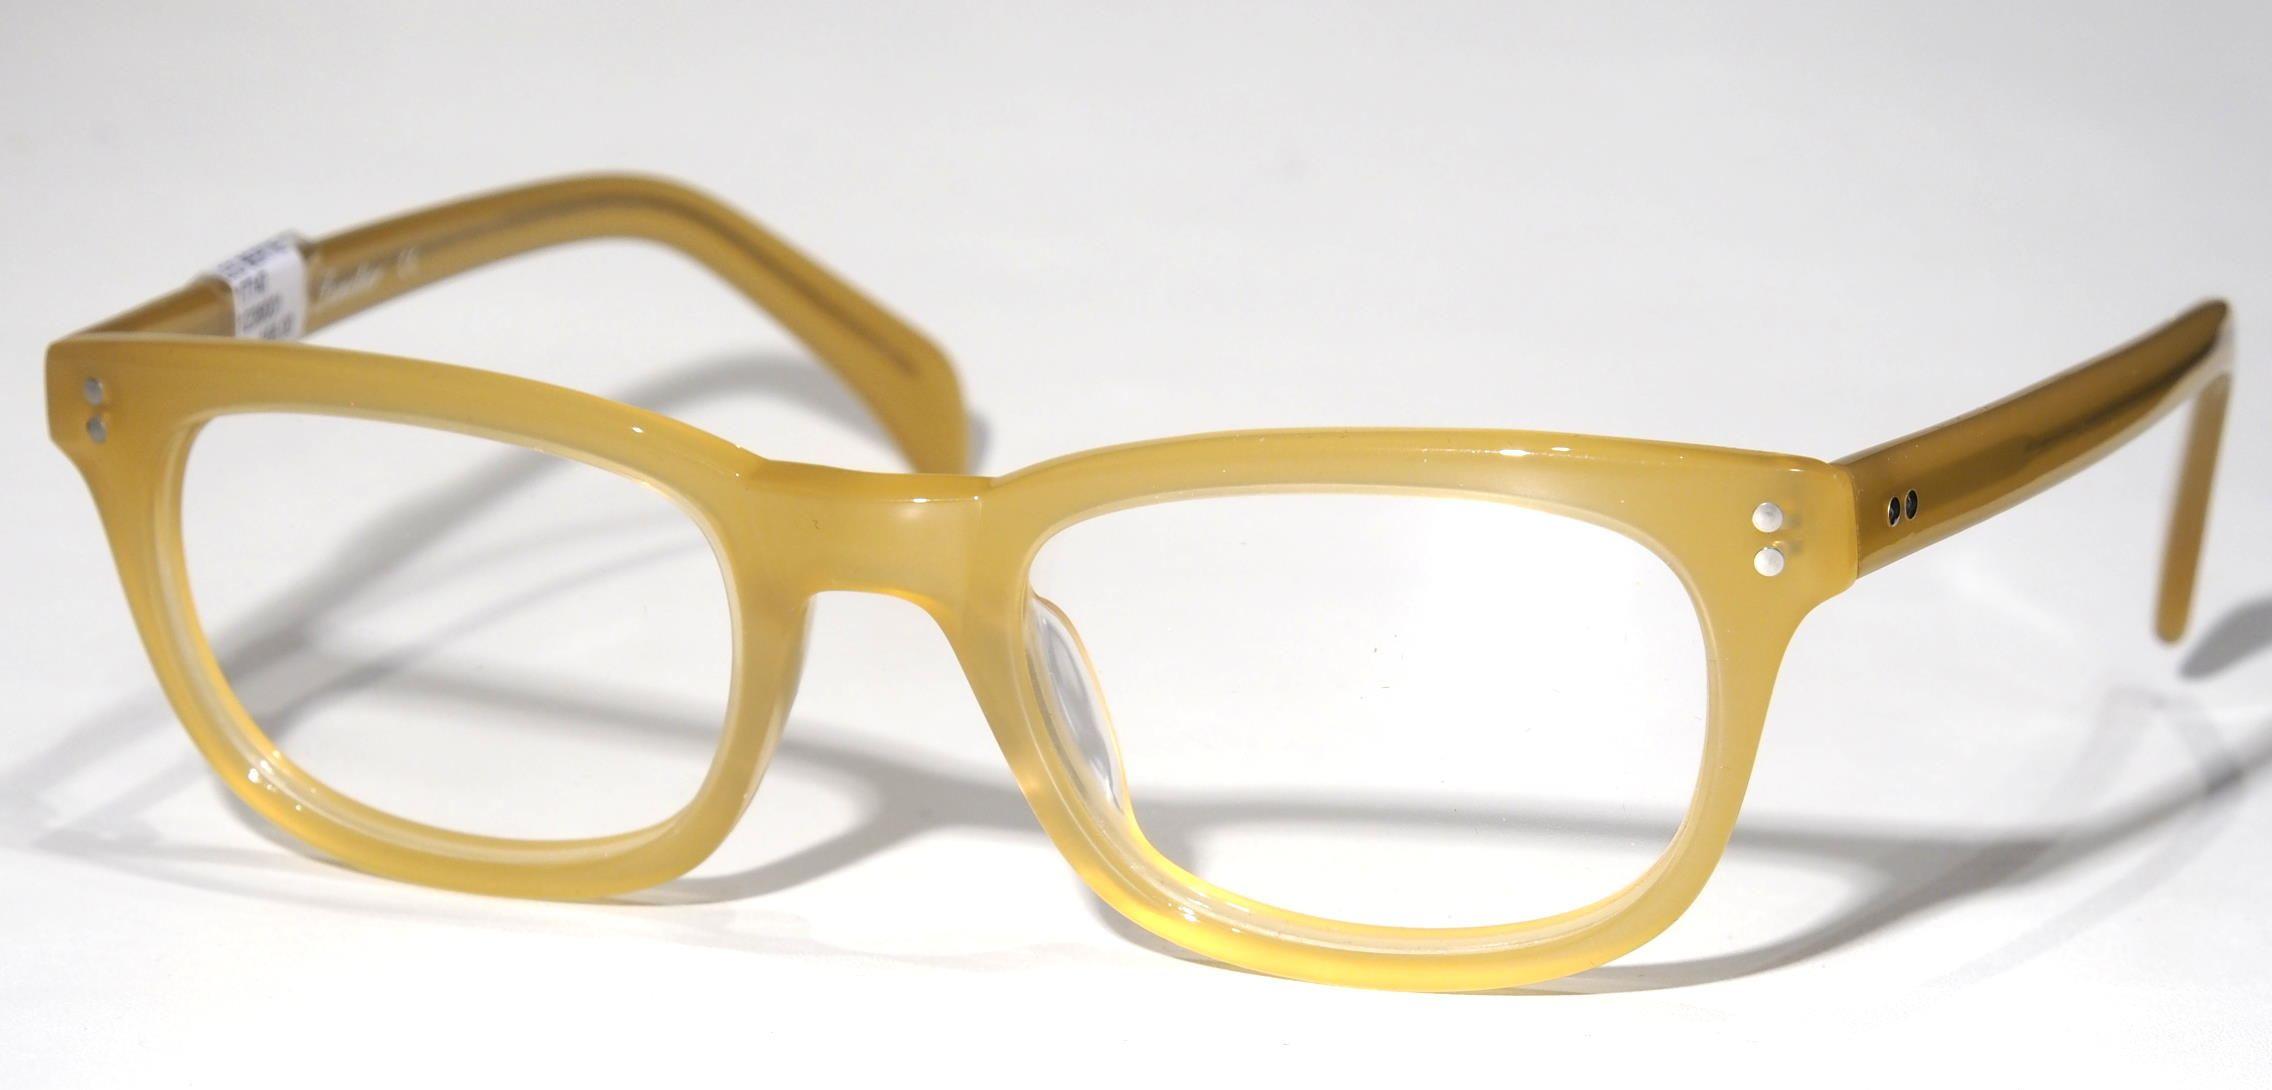 Lesca Lunettes, eyewear Pantobrille, Bertie col.17